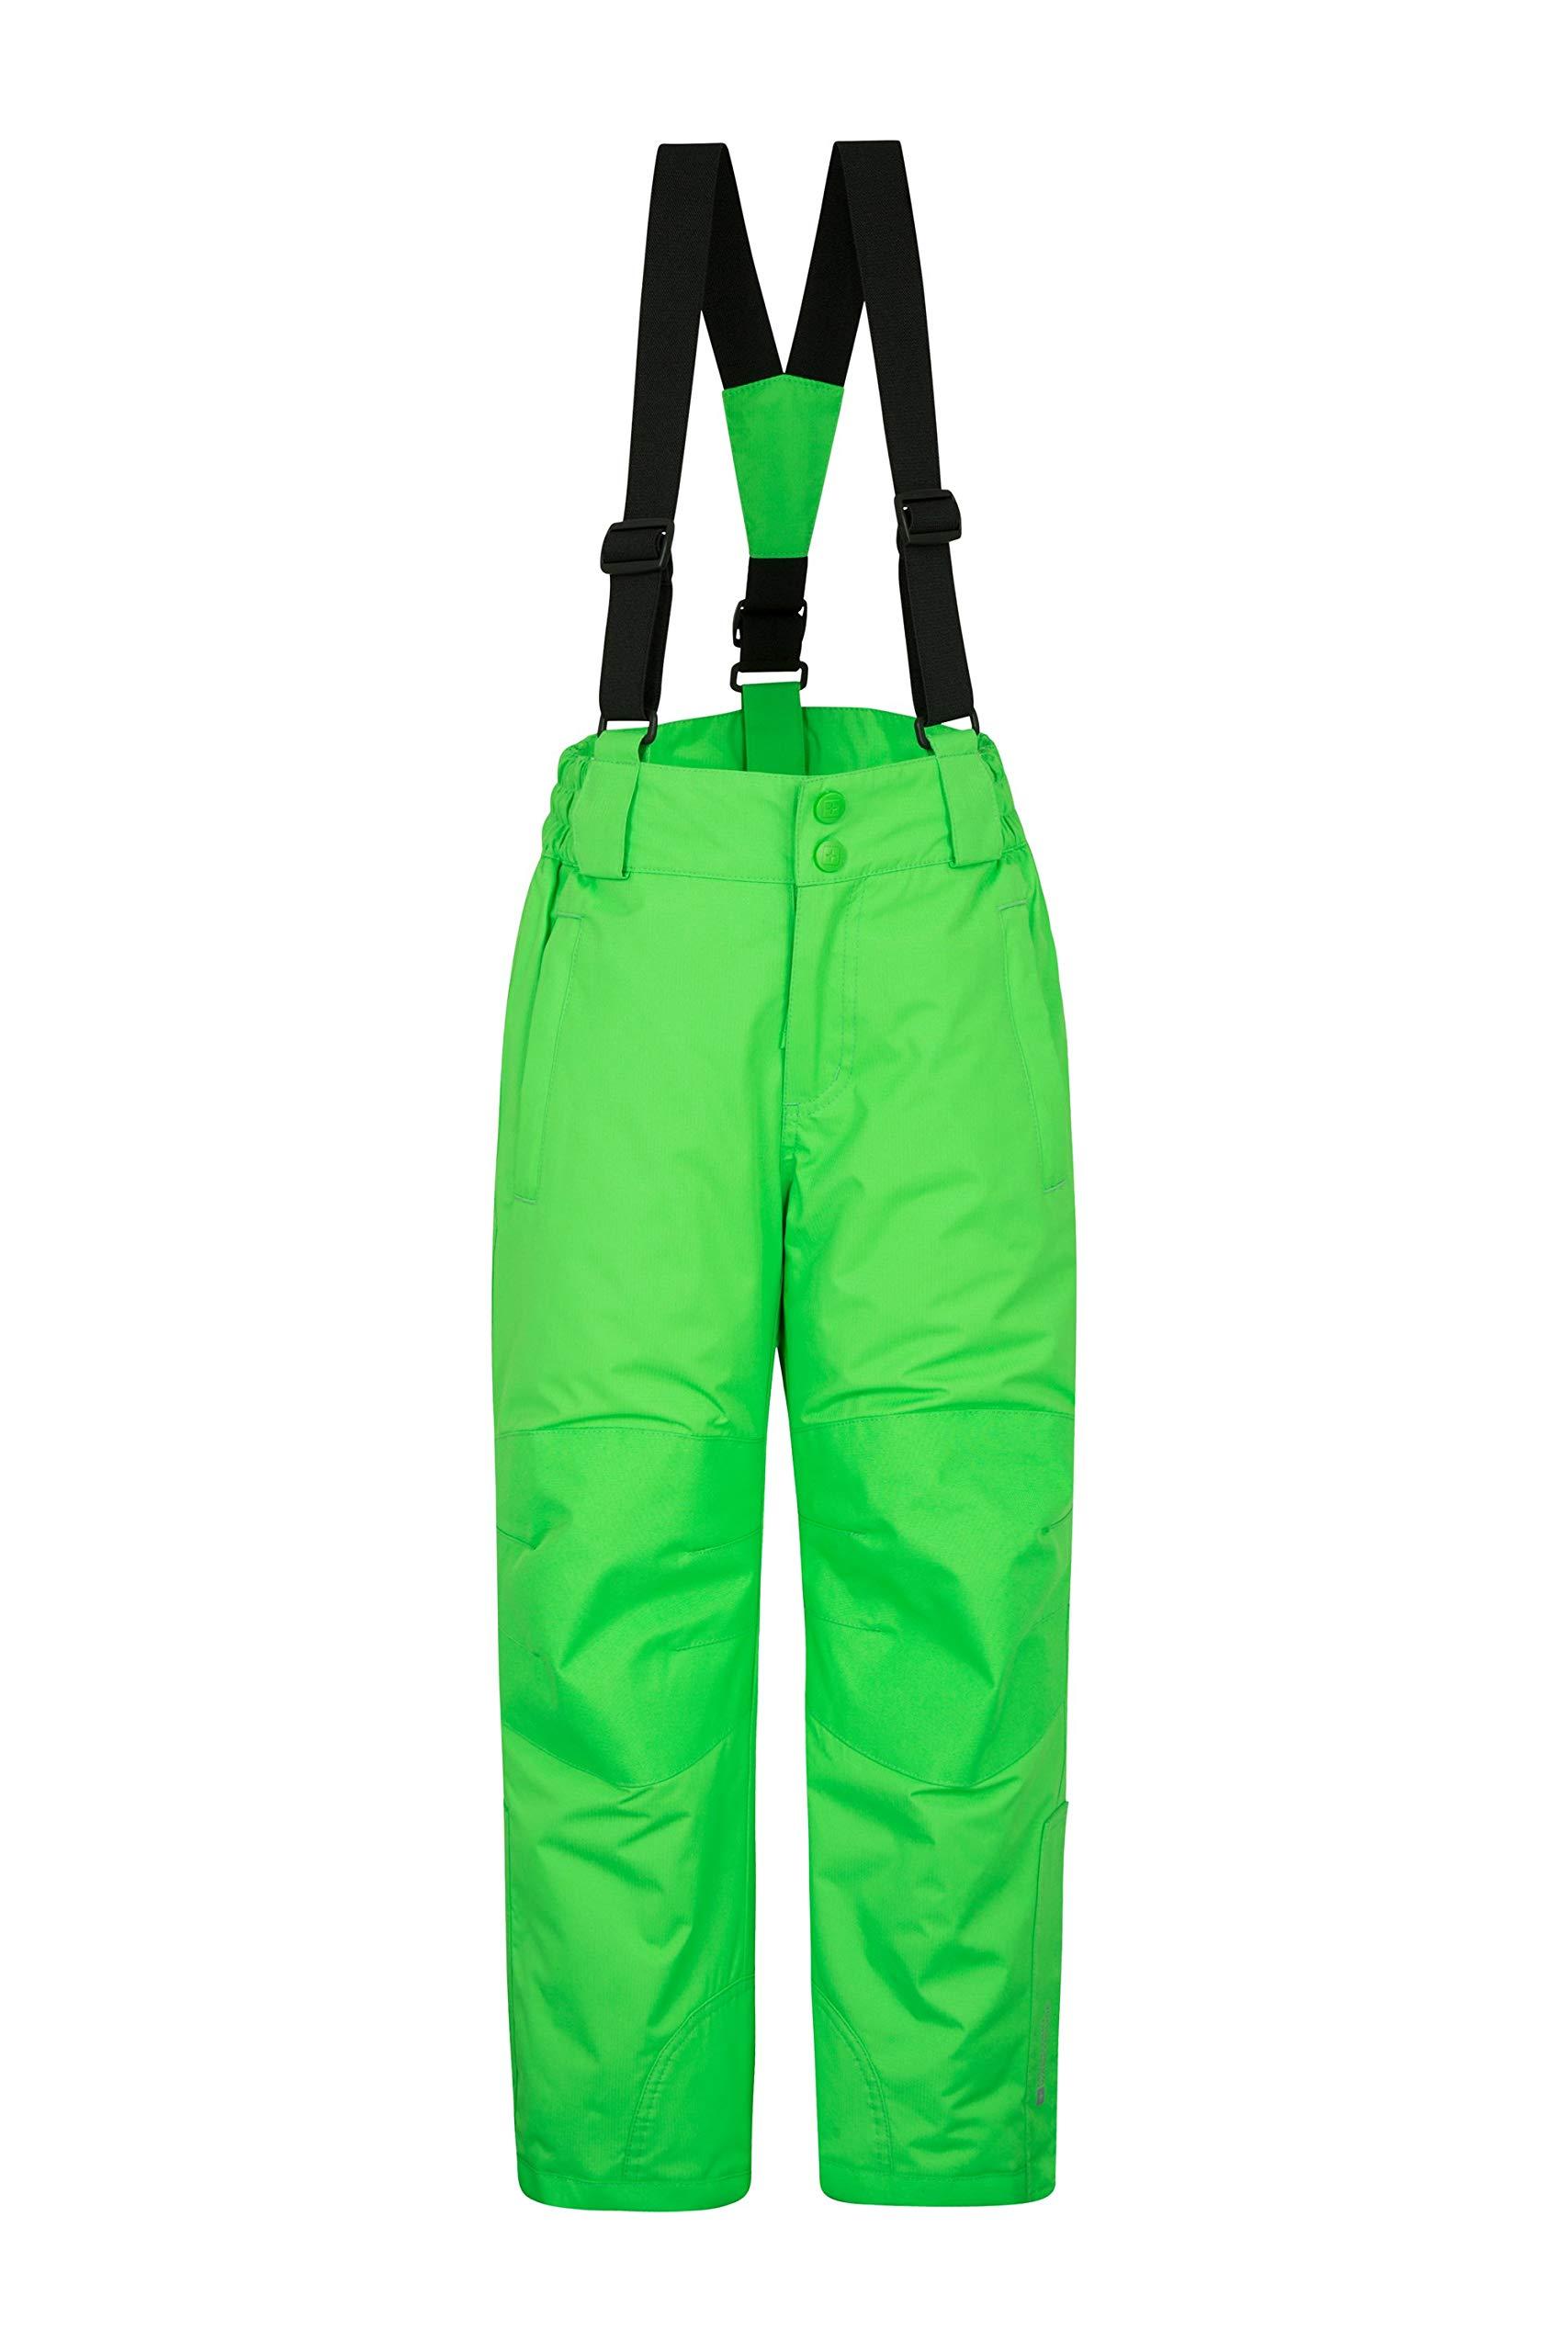 Mountain Warehouse Raptor Kids Snow Pants - Detachable Suspenders Green 9-10 Years by Mountain Warehouse